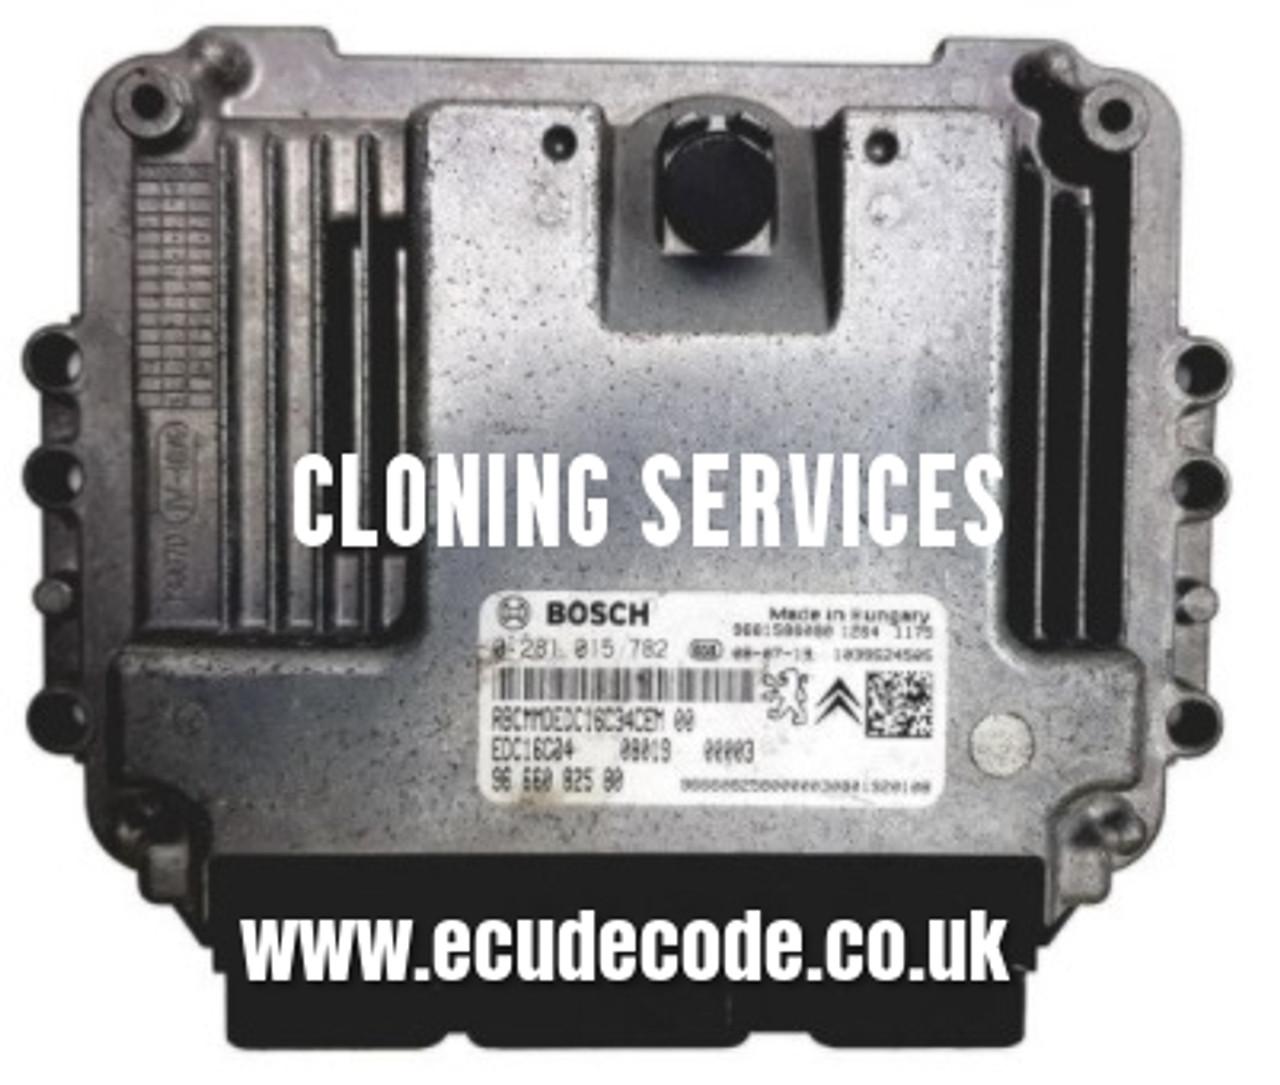 0281015782 | 0 281 015 782 | 96 664 322 80 | EDC16C34 | Peugeot Bipper / Citroen Nemo | Bosch Diesel Engine ECU For Sale with Cloning Services